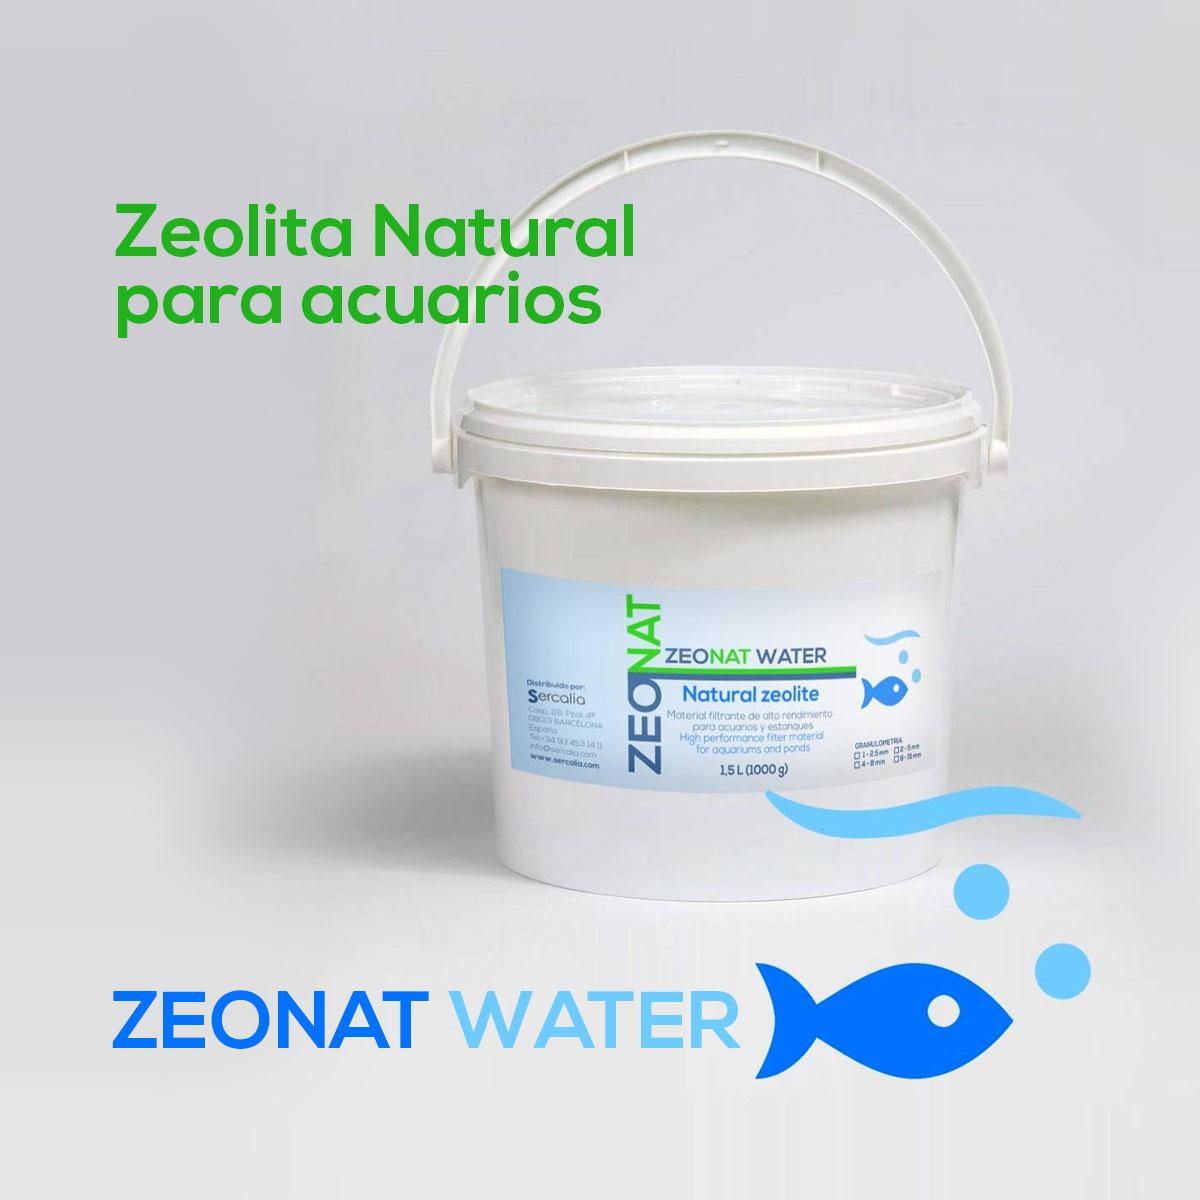 zeolita natural Zeonat Green para acuarios